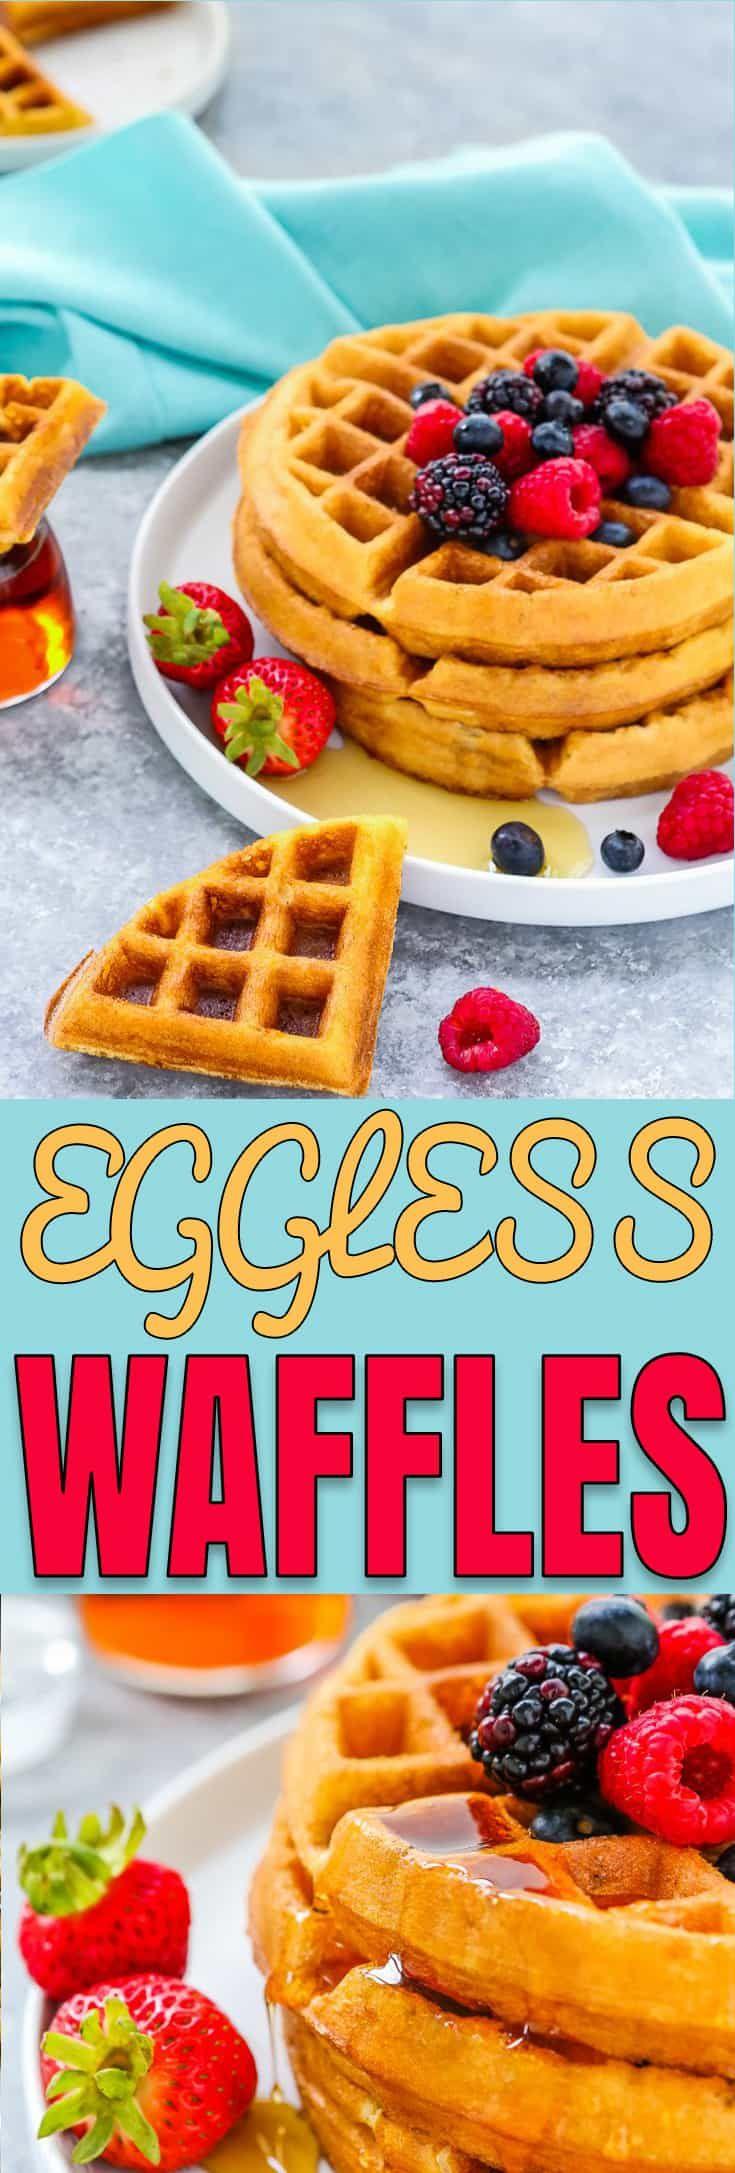 Eggless Waffles Recipe Homemade Waffles Easy Waffle Recipe Eggless Recipes